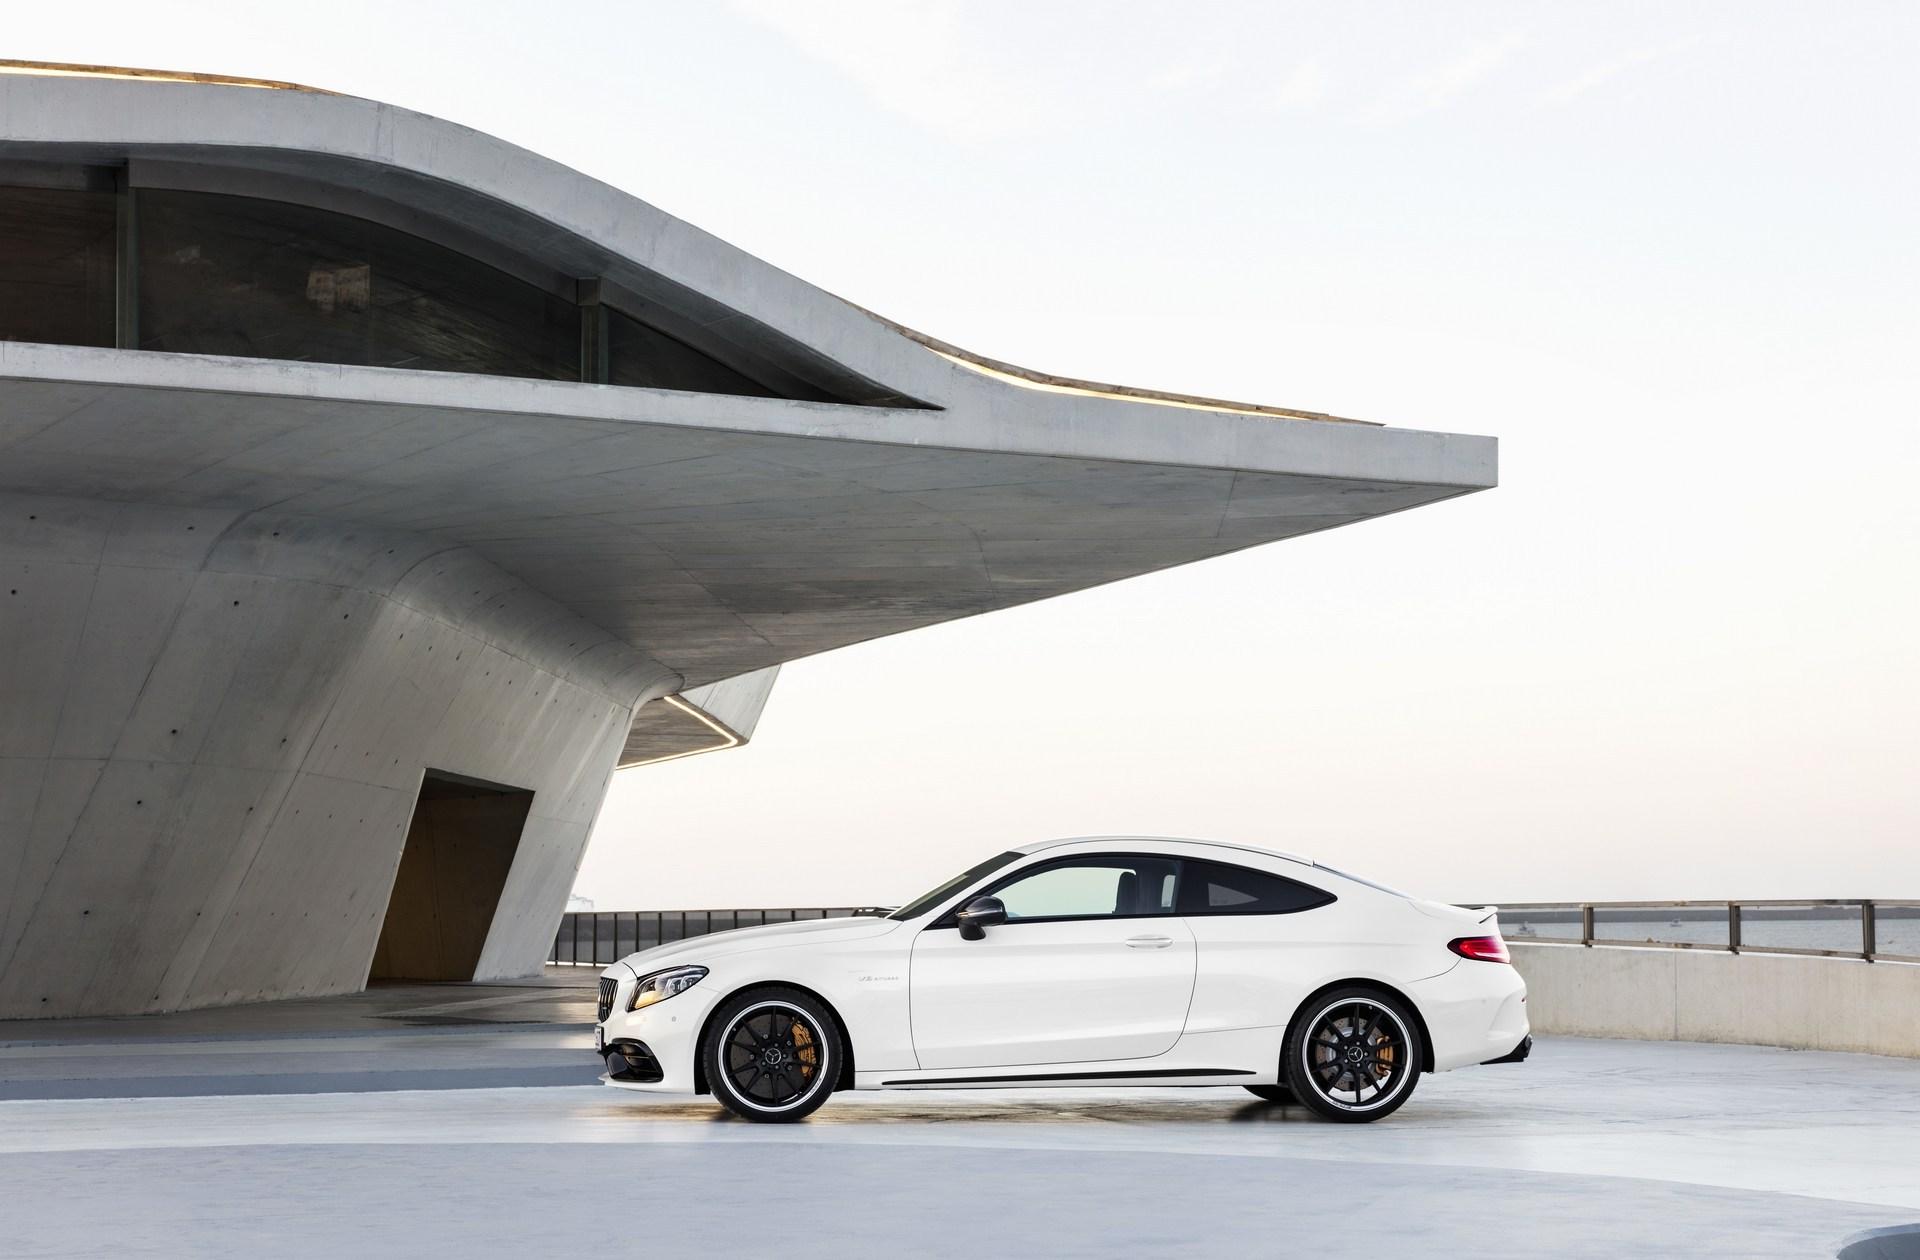 Mercedes-AMG-C63-Coupe-24.jpg